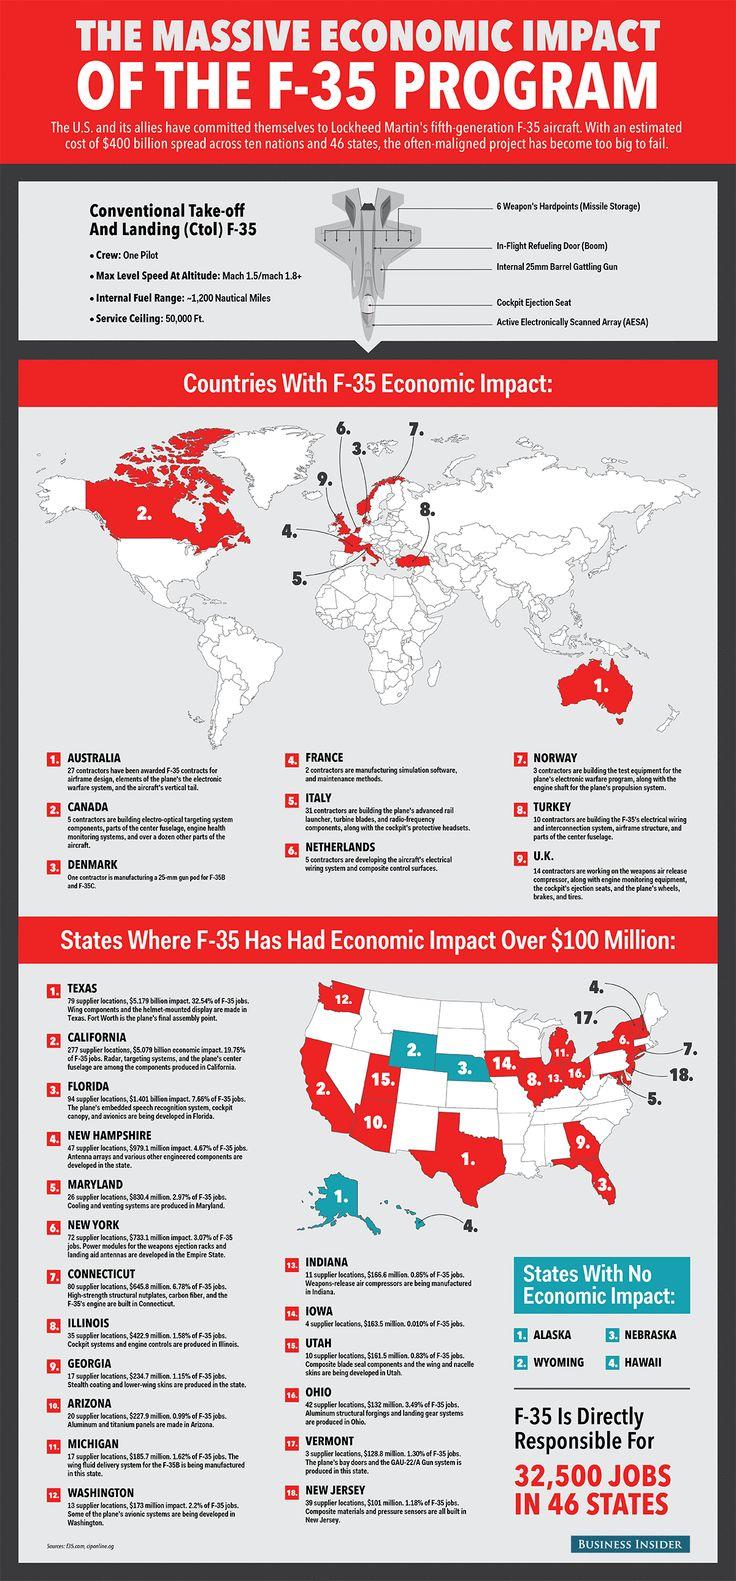 The Massive Economic Impact of the F-35 Program